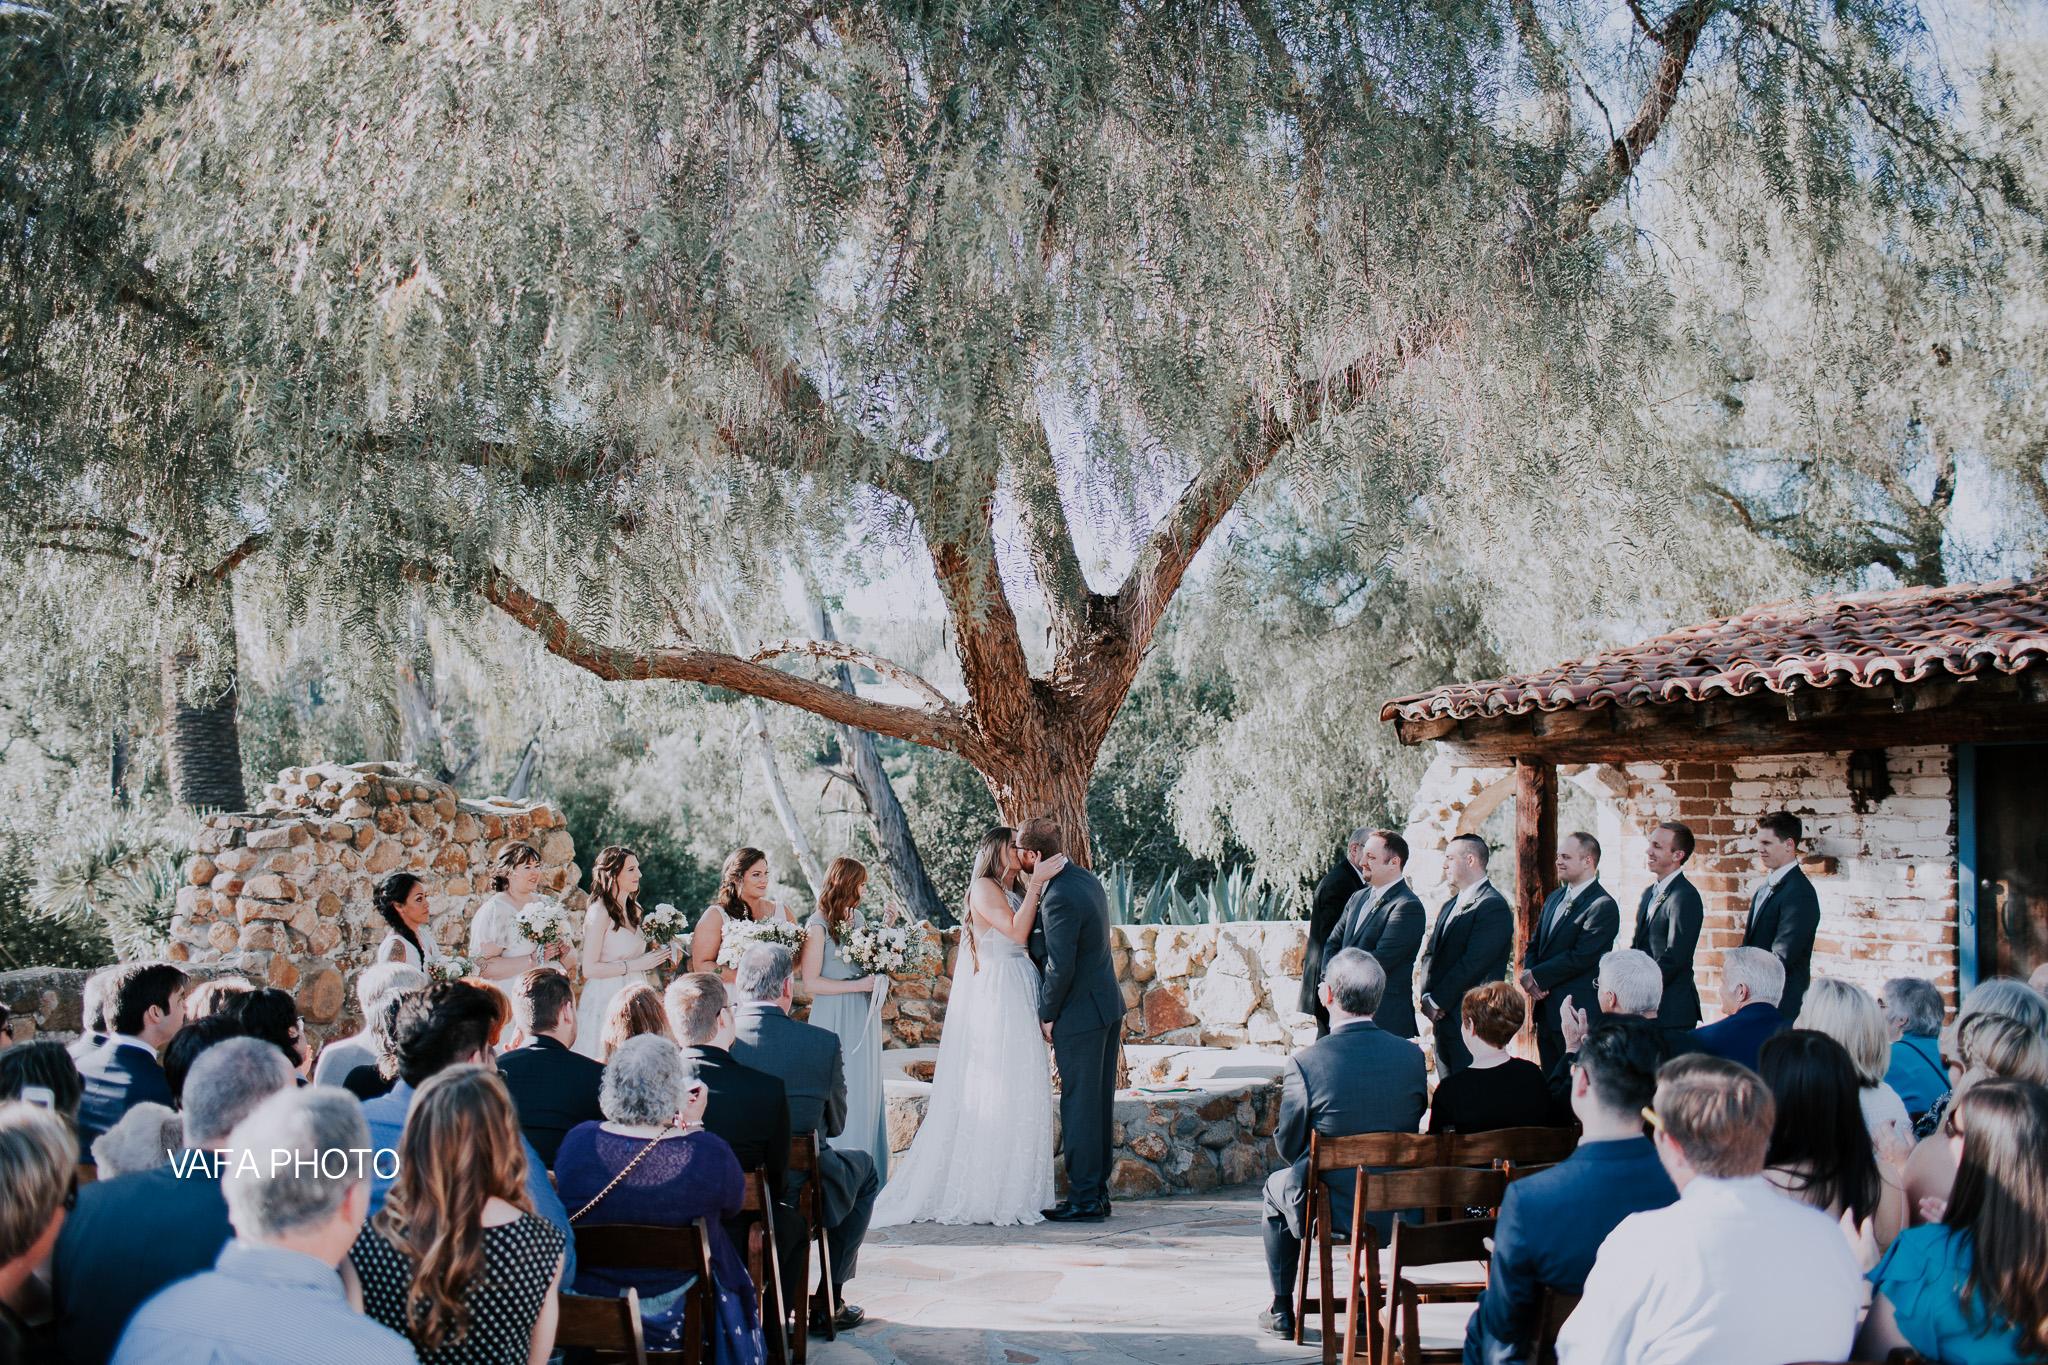 Leo-Carrillo-Ranch-Wedding-Lauren-Mike-Vafa-Photo-642.jpg